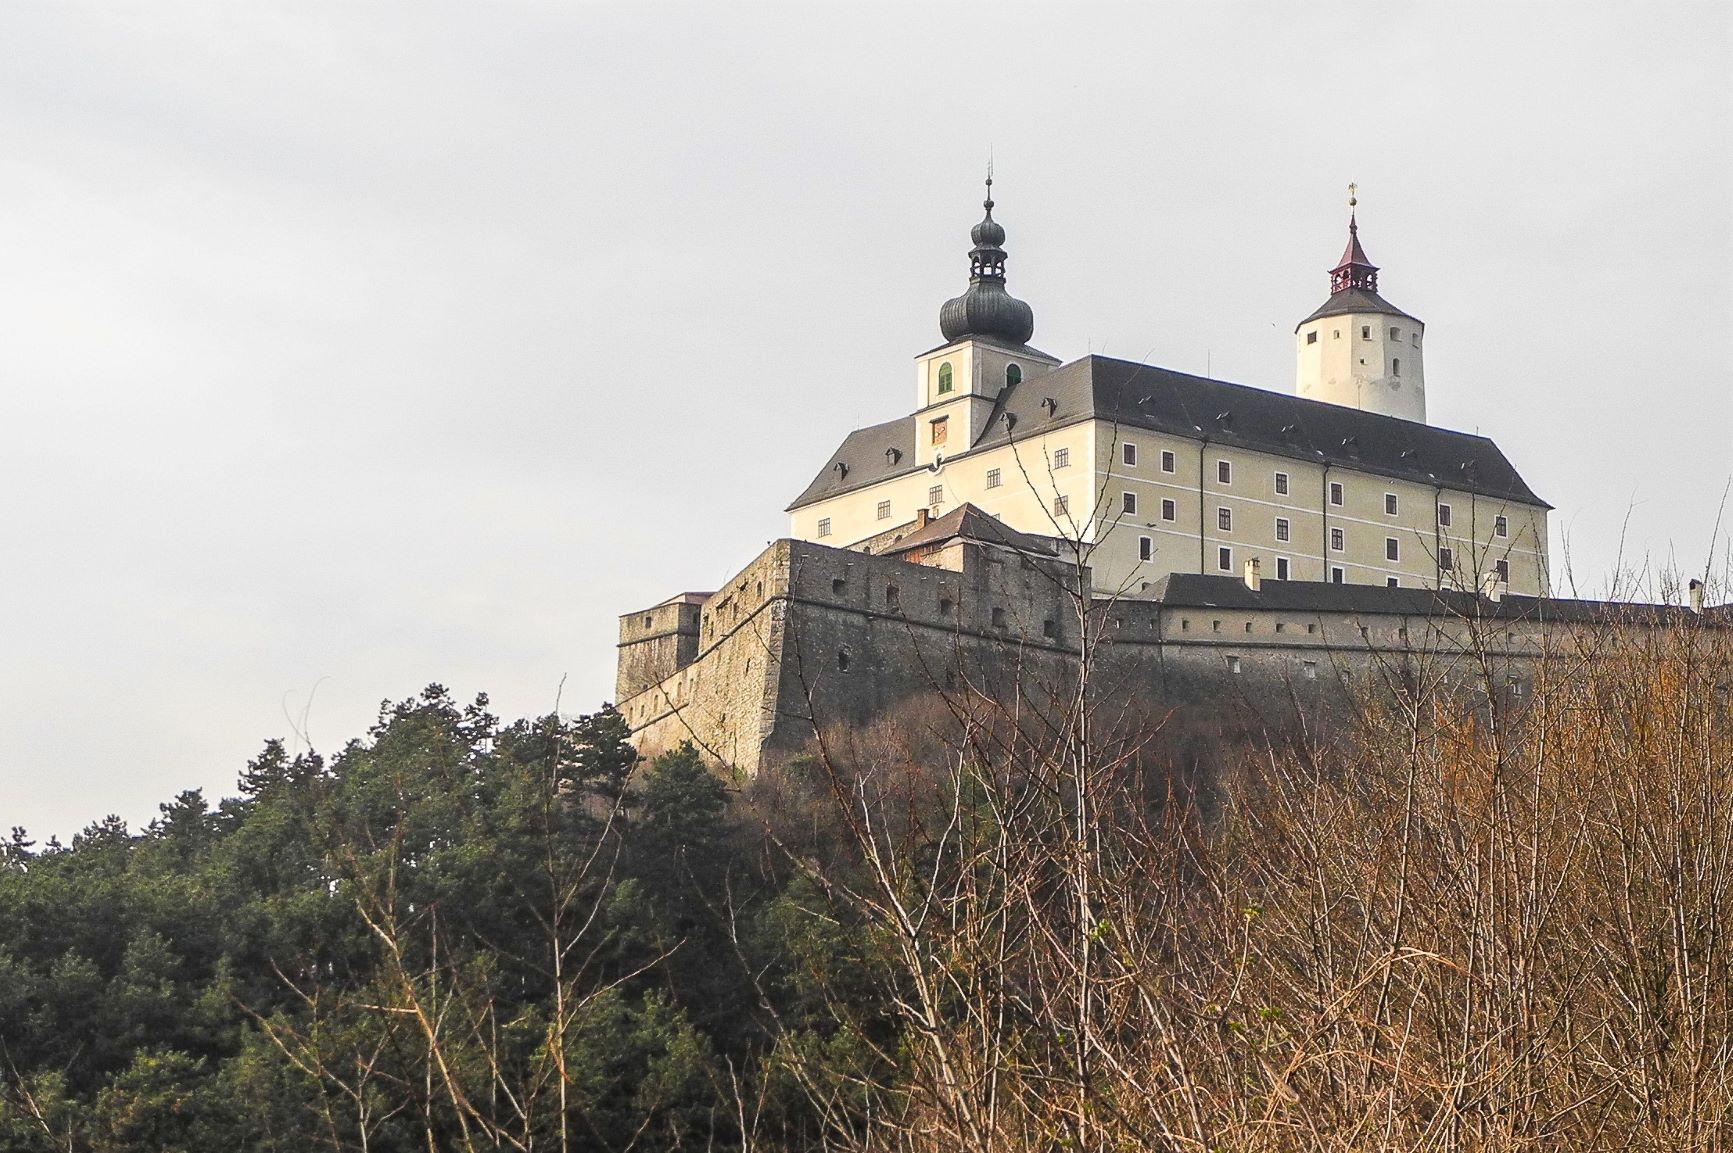 Burgenlandroute Etappe 02: Mattersburg – Scheiblingkirchen